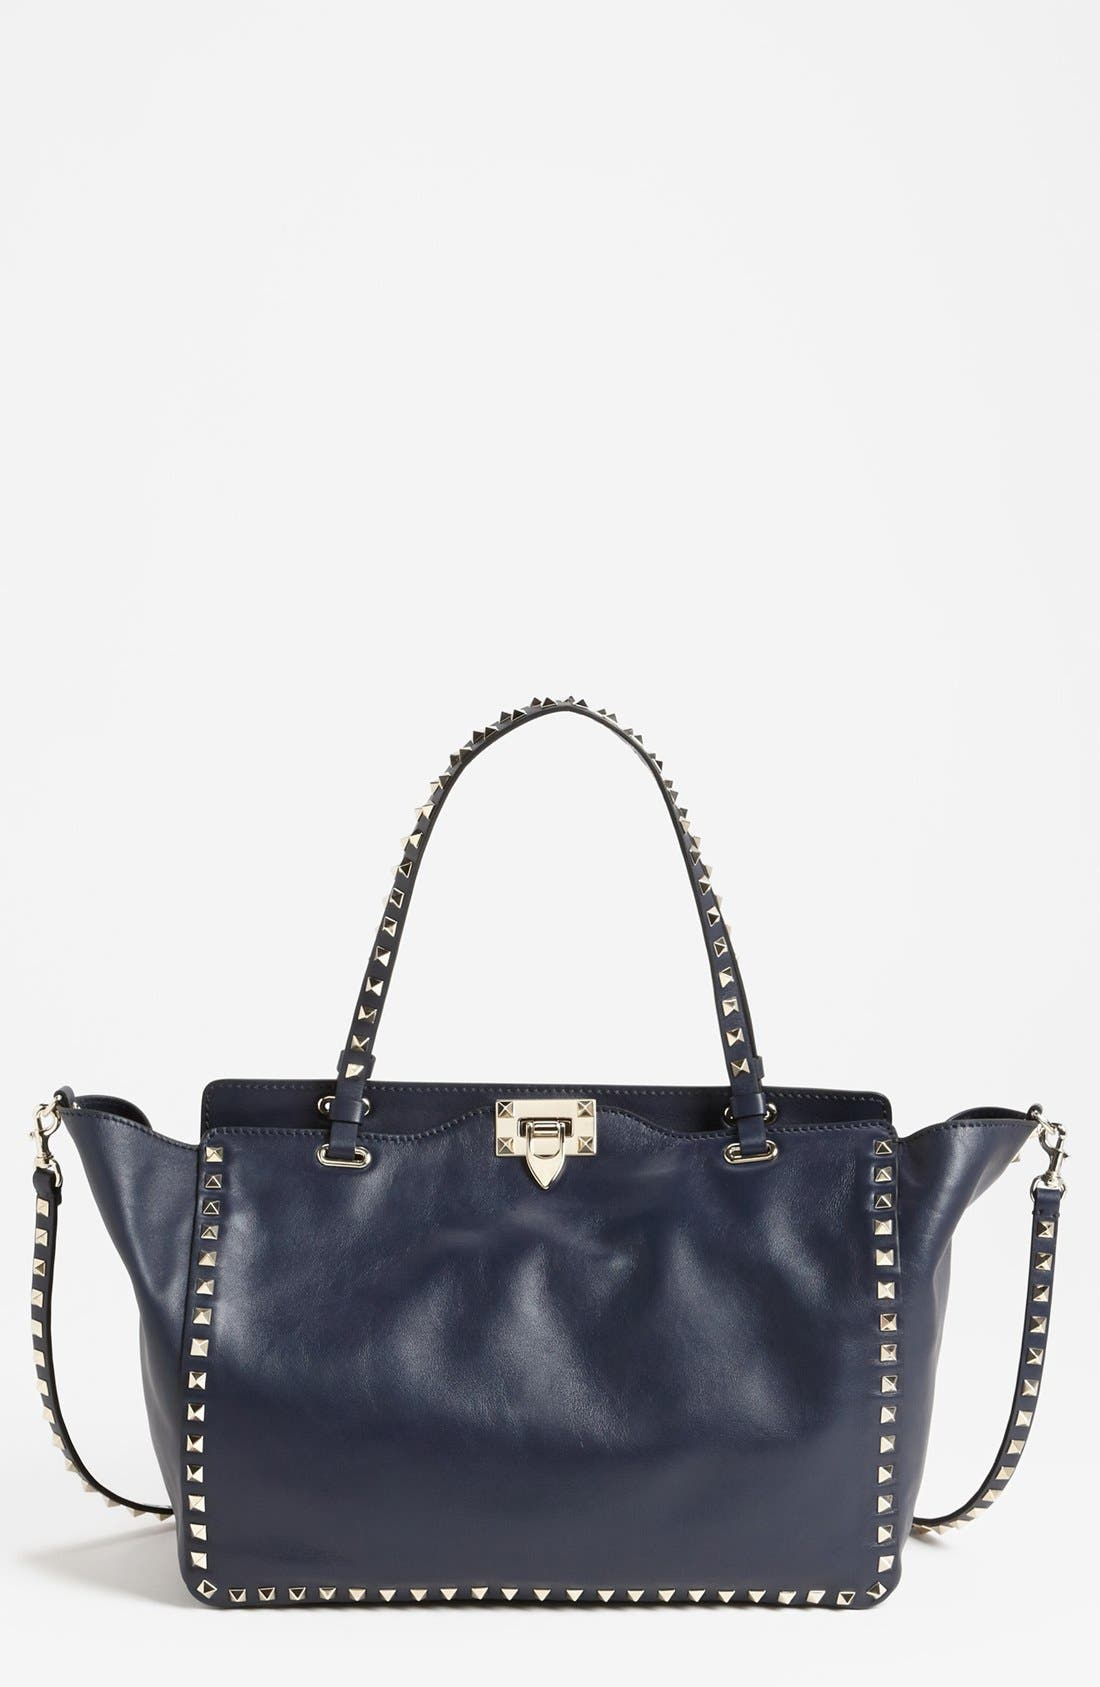 Alternate Image 1 Selected - Valentino 'Rockstud - Medium' Double Handle Leather Tote